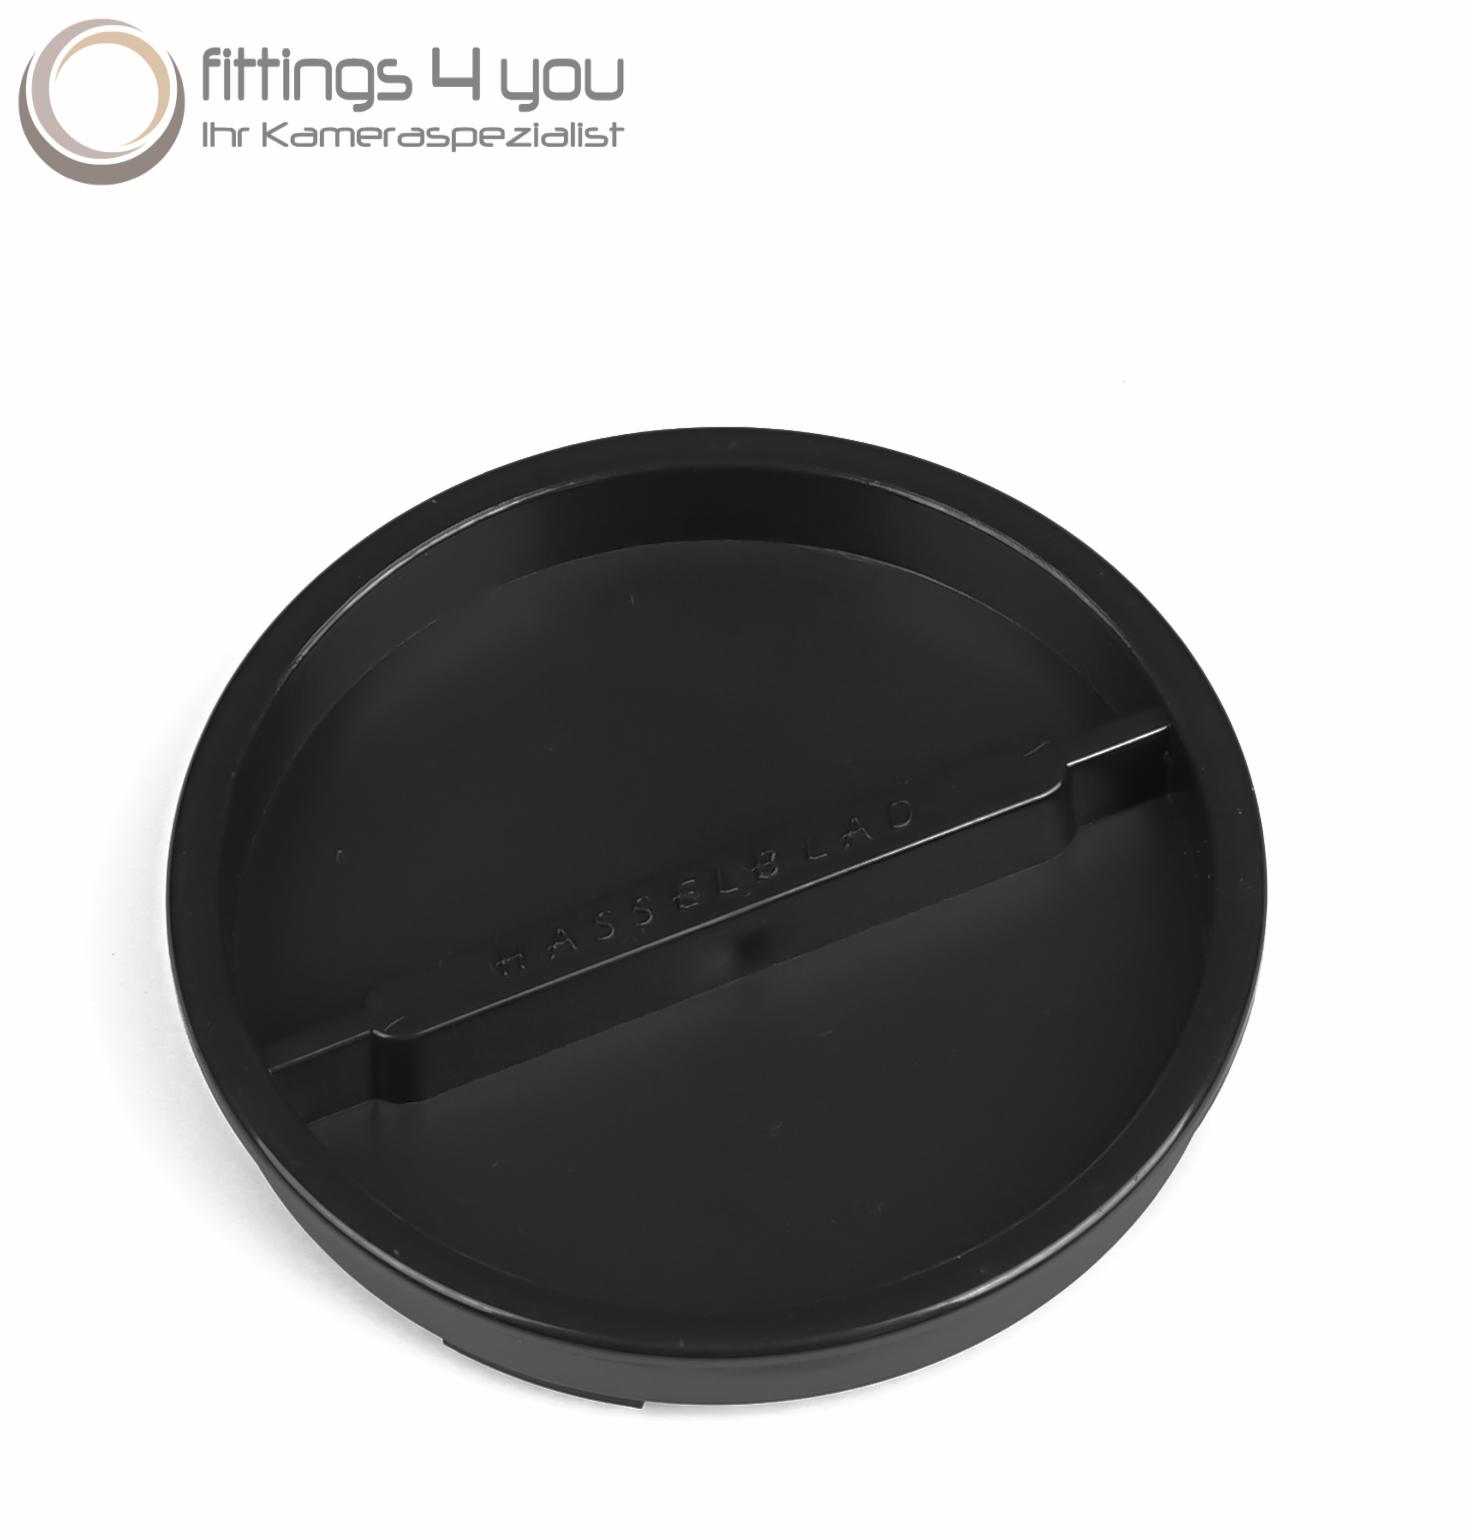 LR distinguen Leica R carcasa tapa tapa tapa objetivamente body cap objetivamente